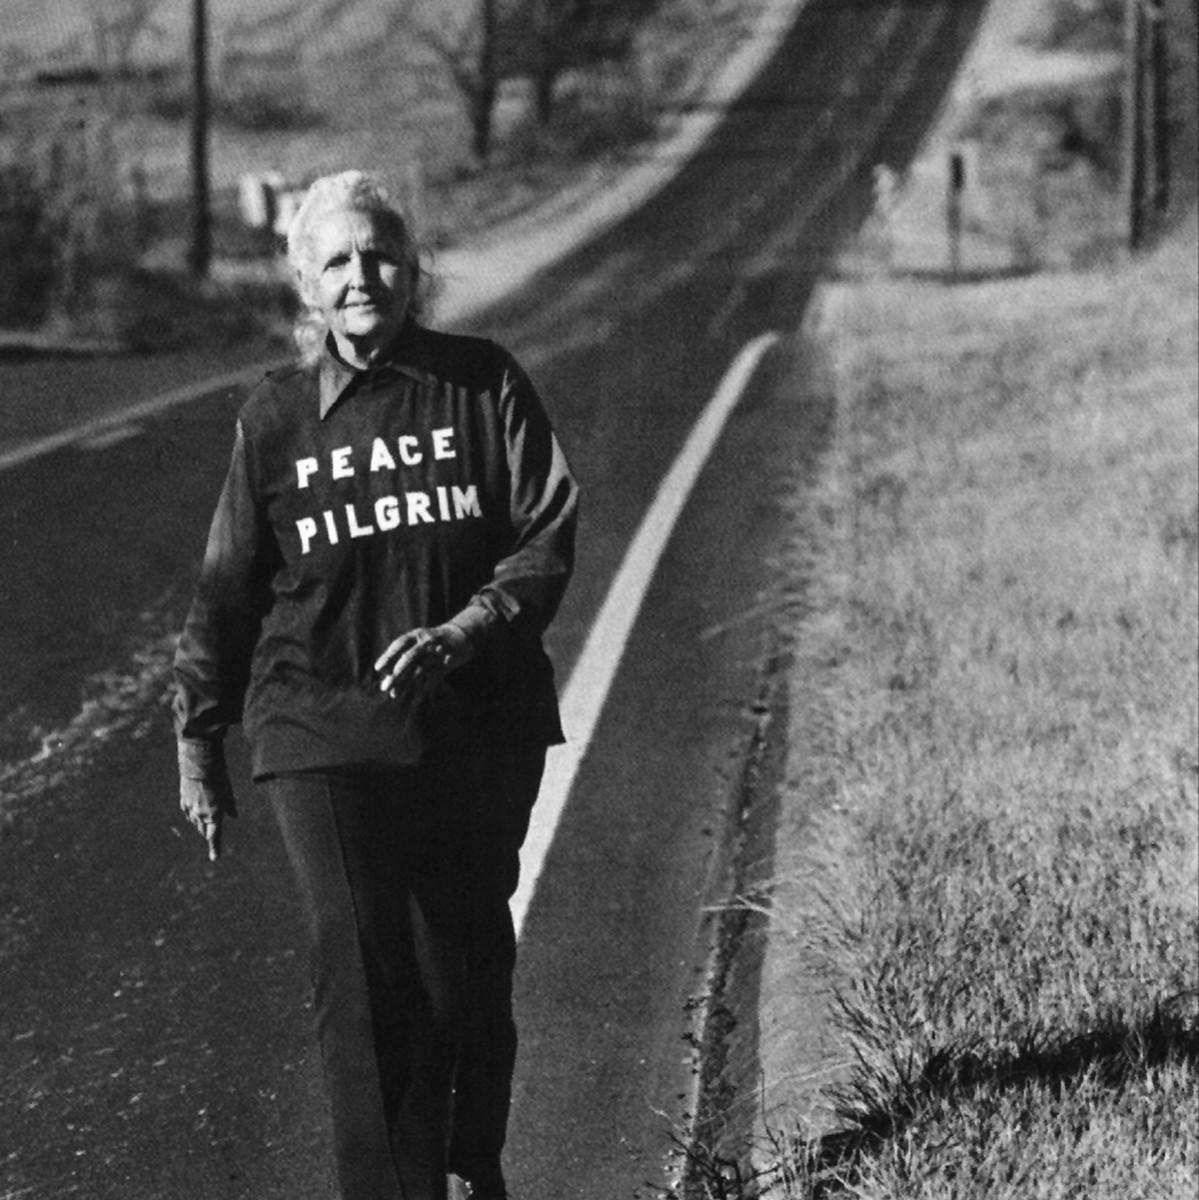 Peace Pilgrim walking